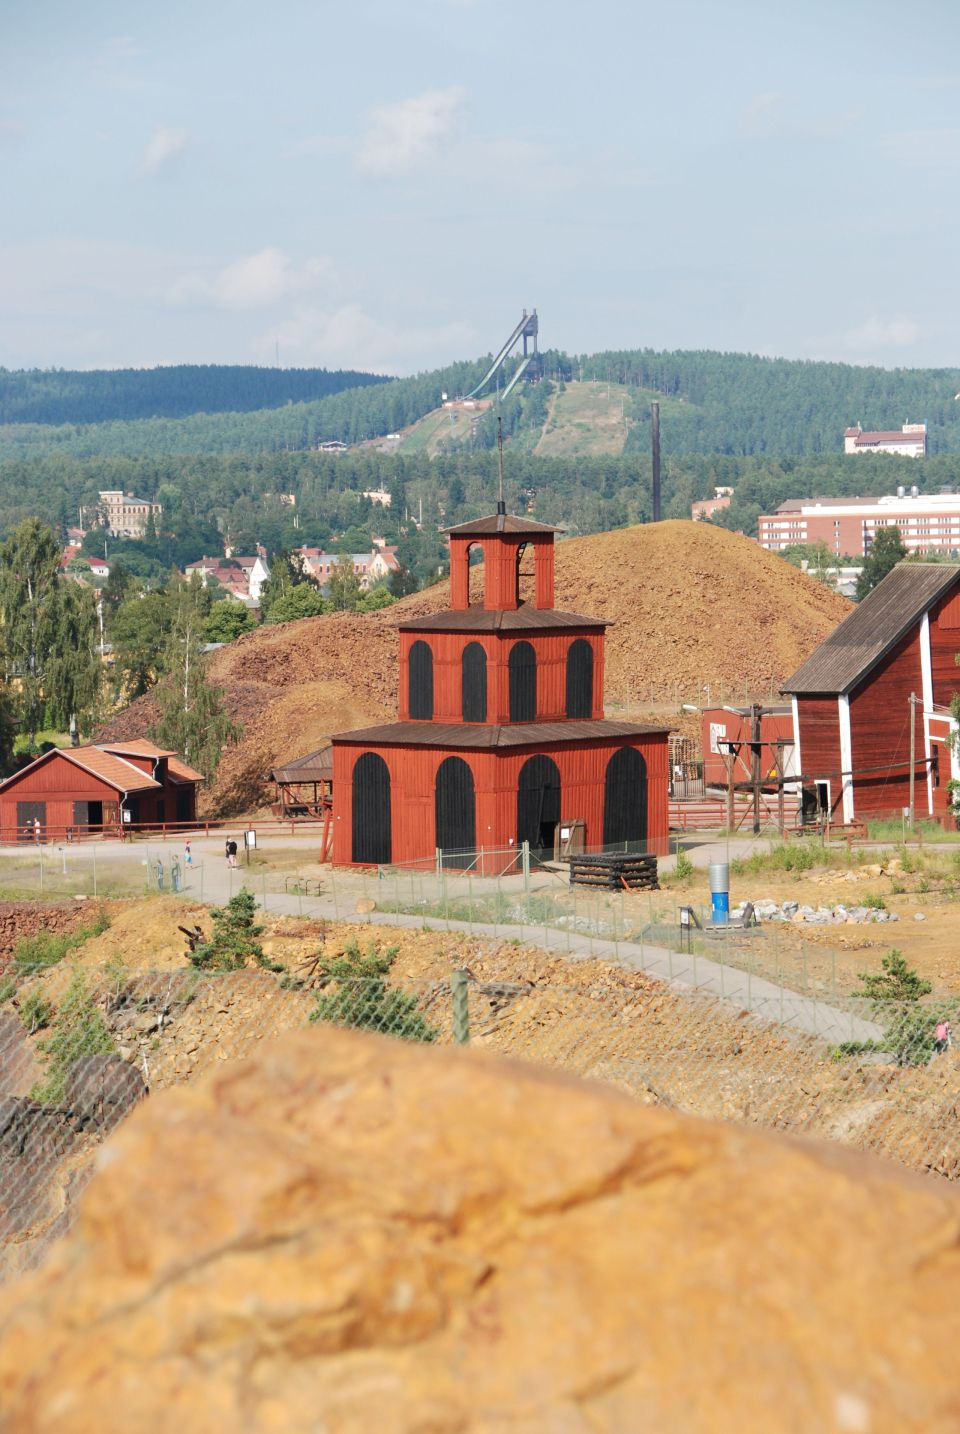 A copper mine, Sweden